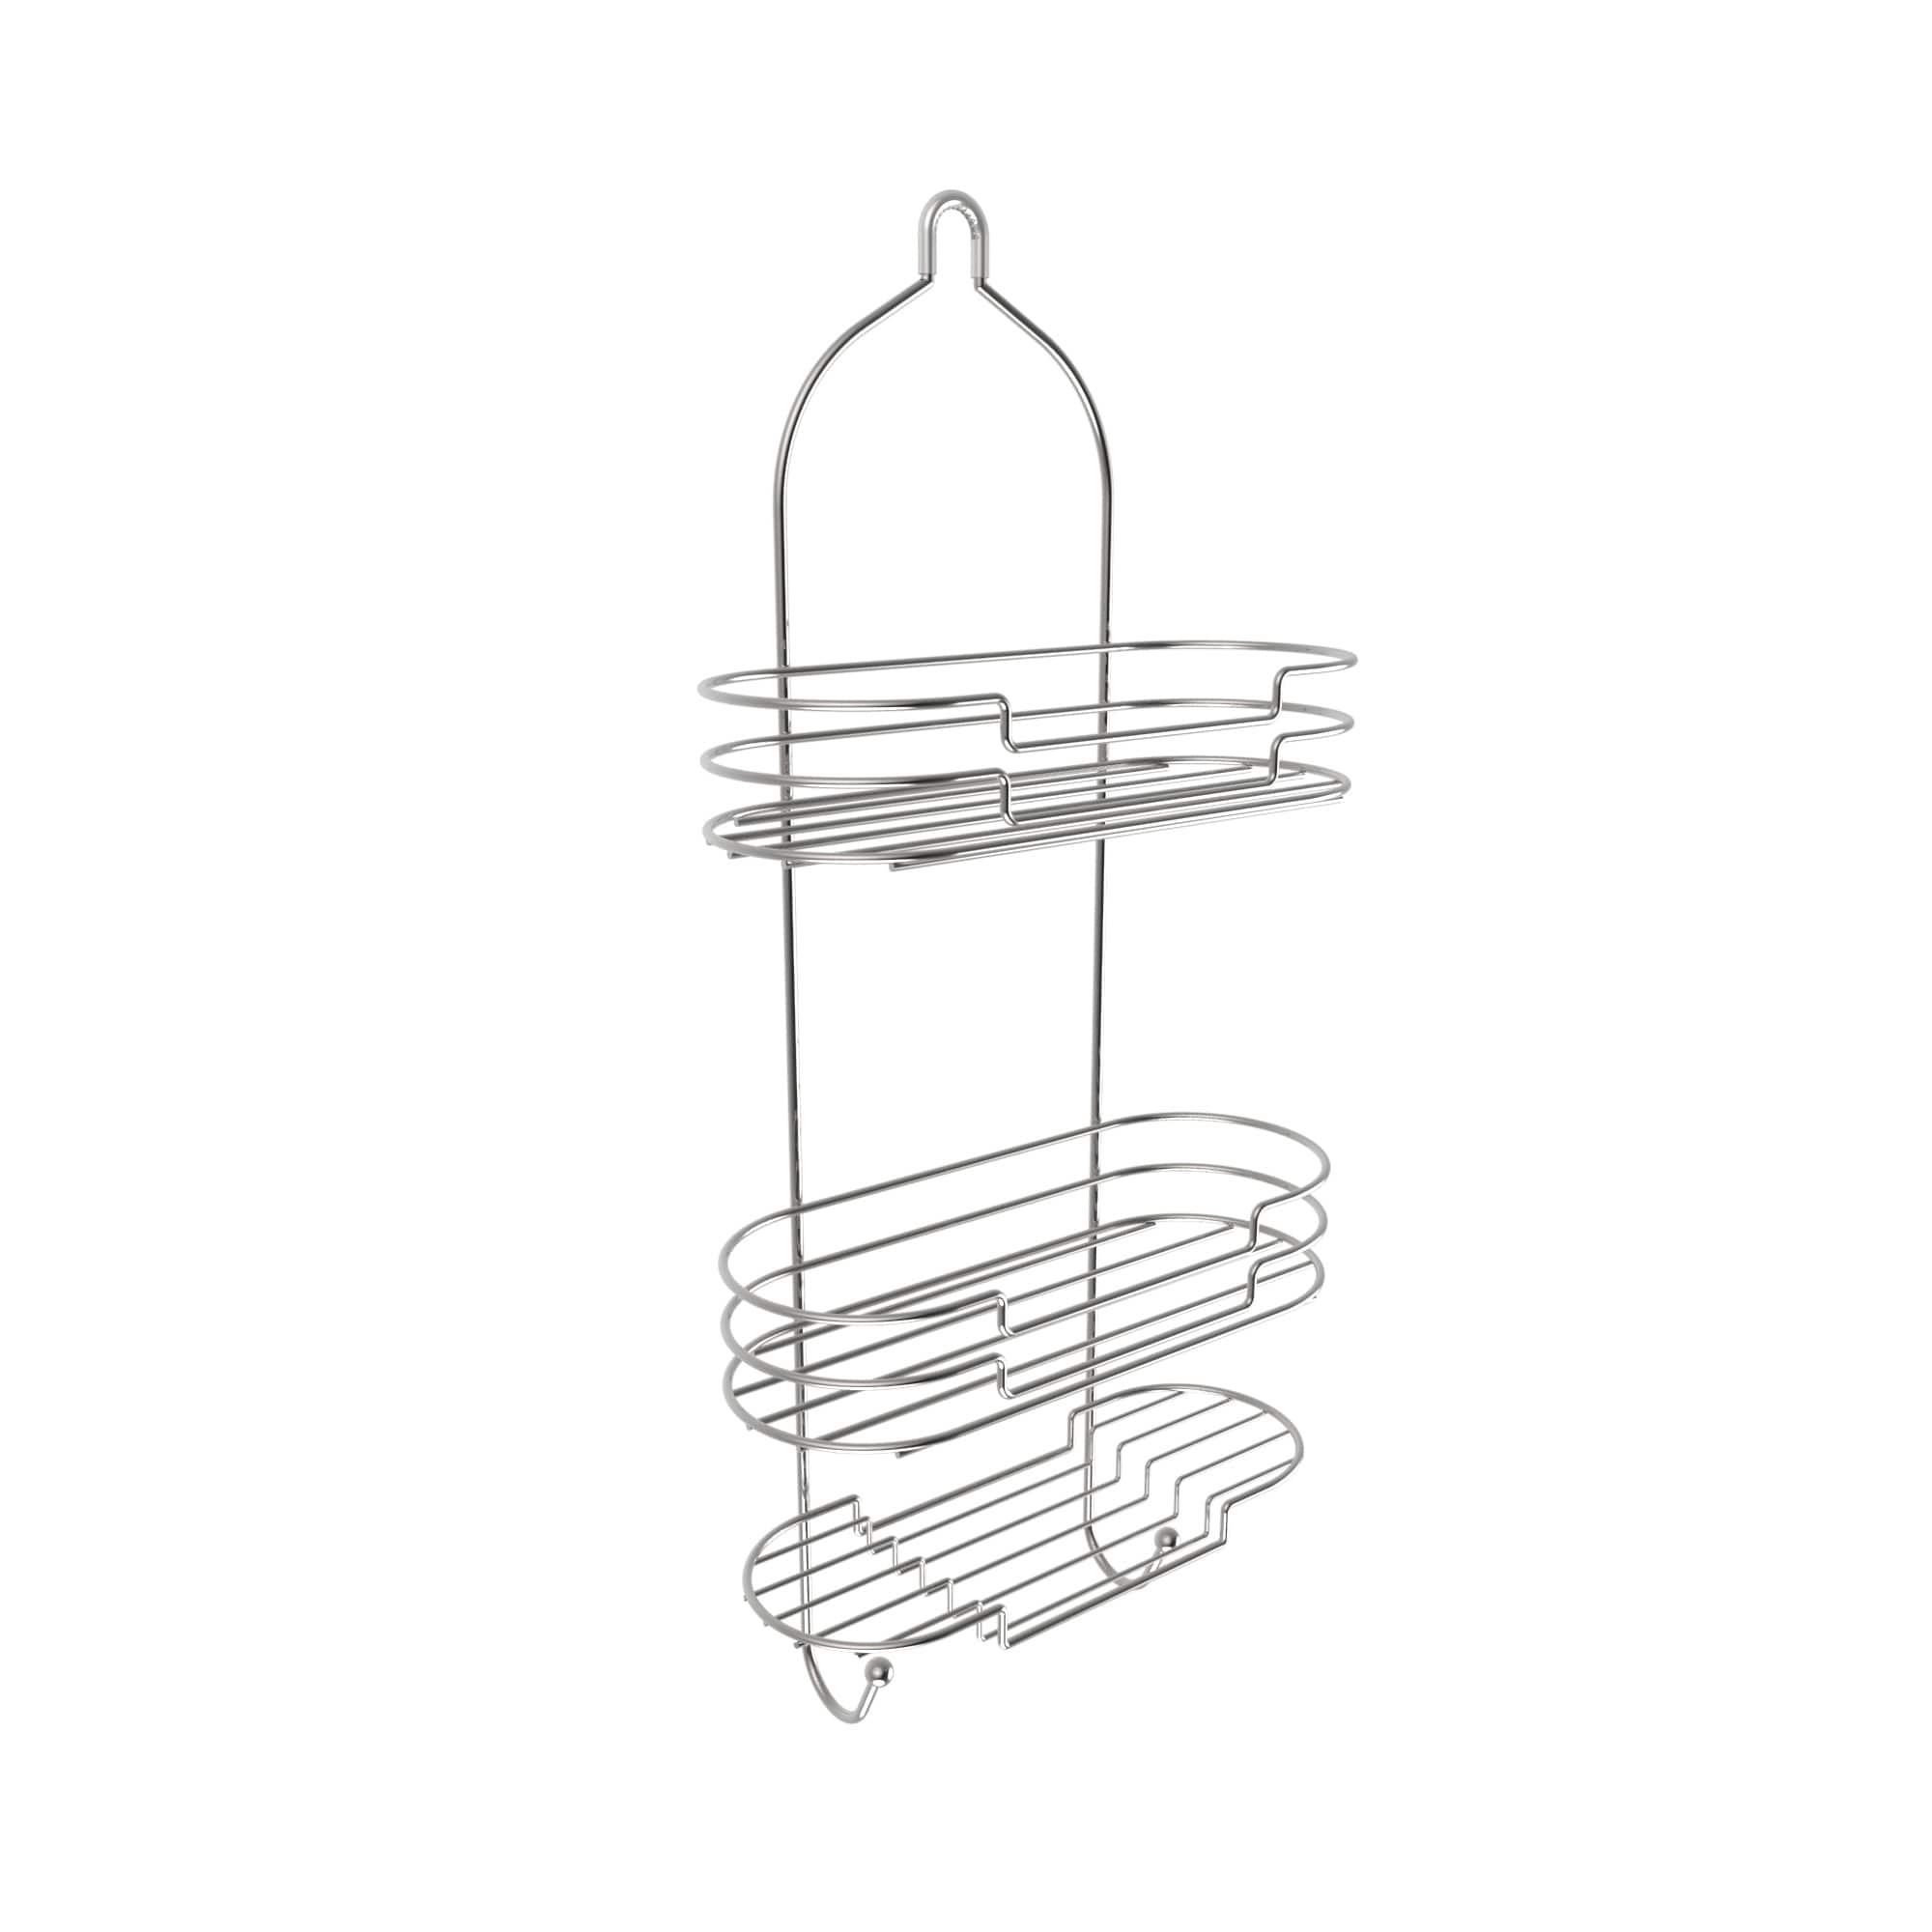 Shop Tall Shower Caddy with Shelves and Hooks- Showerhead Bath ...